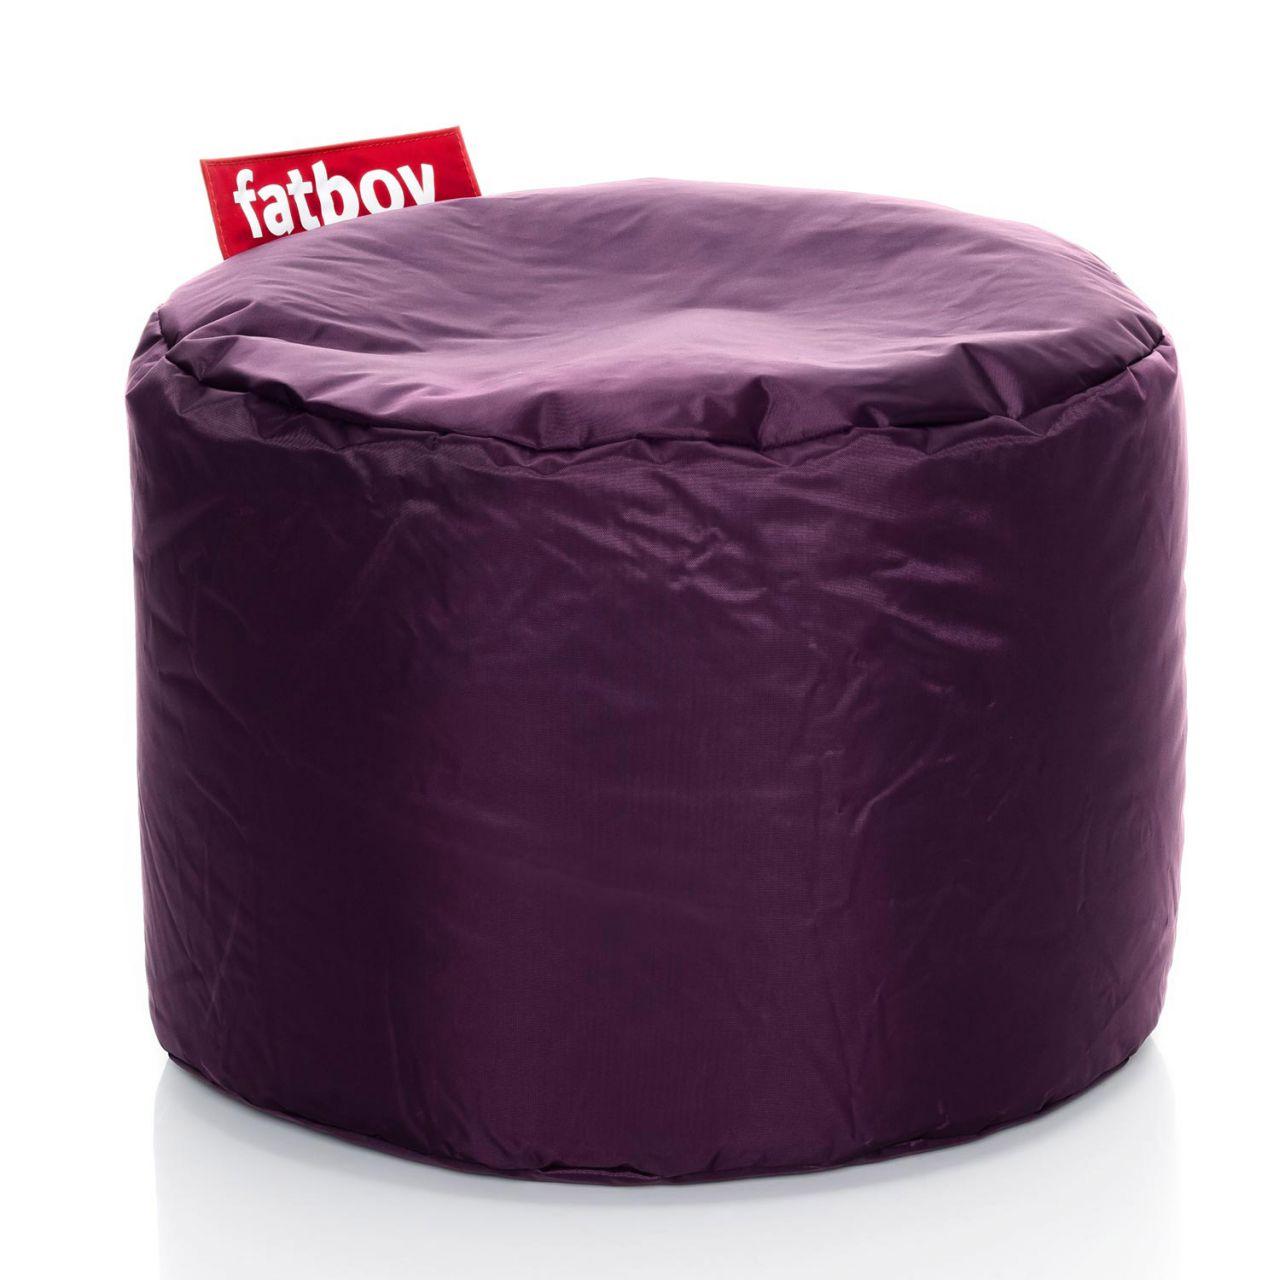 Fatboy - Point Sitzhocker 900.0148